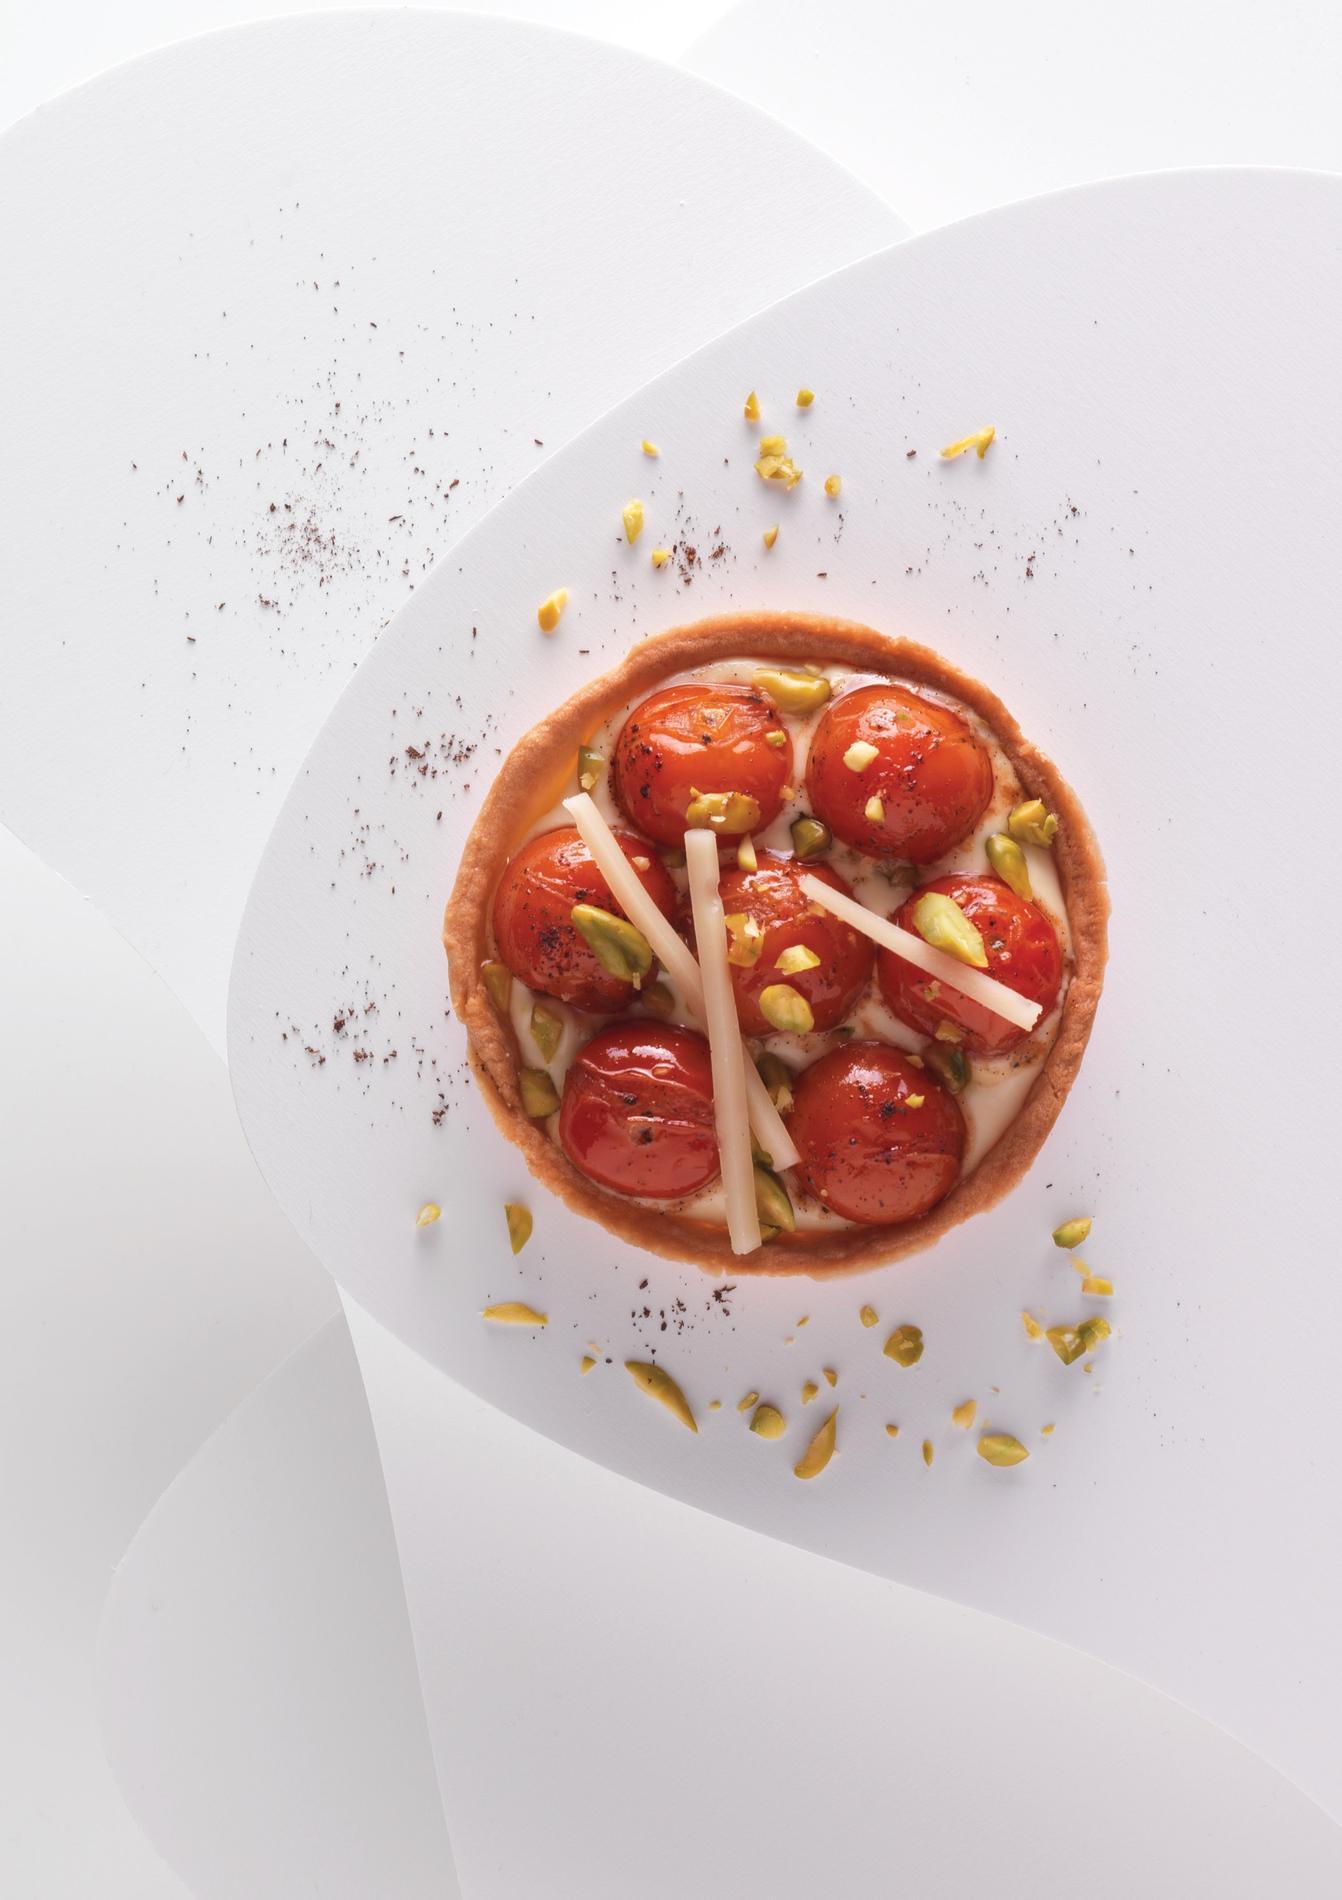 recette tarte sal e tomates et abondance cuisine madame figaro. Black Bedroom Furniture Sets. Home Design Ideas